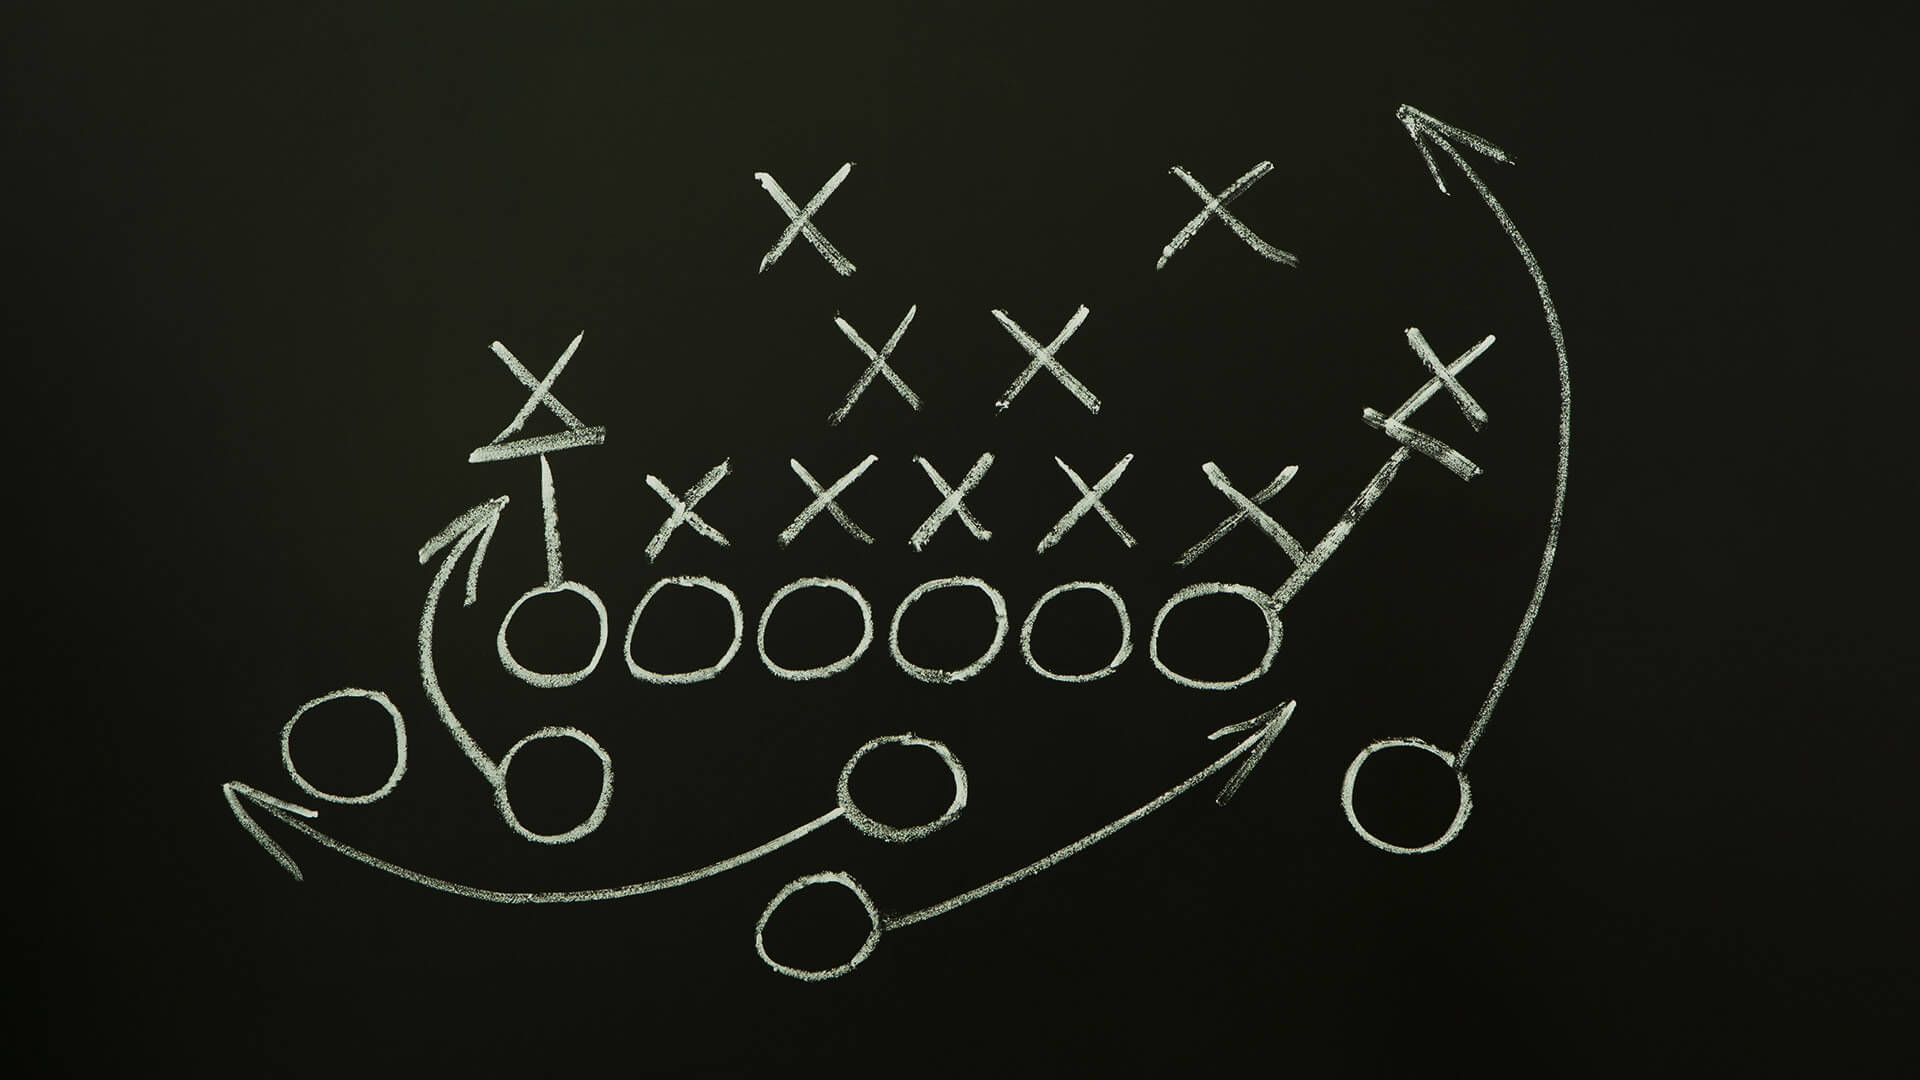 5 tácticas de búsqueda local que probablemente sus competidores no estén usando